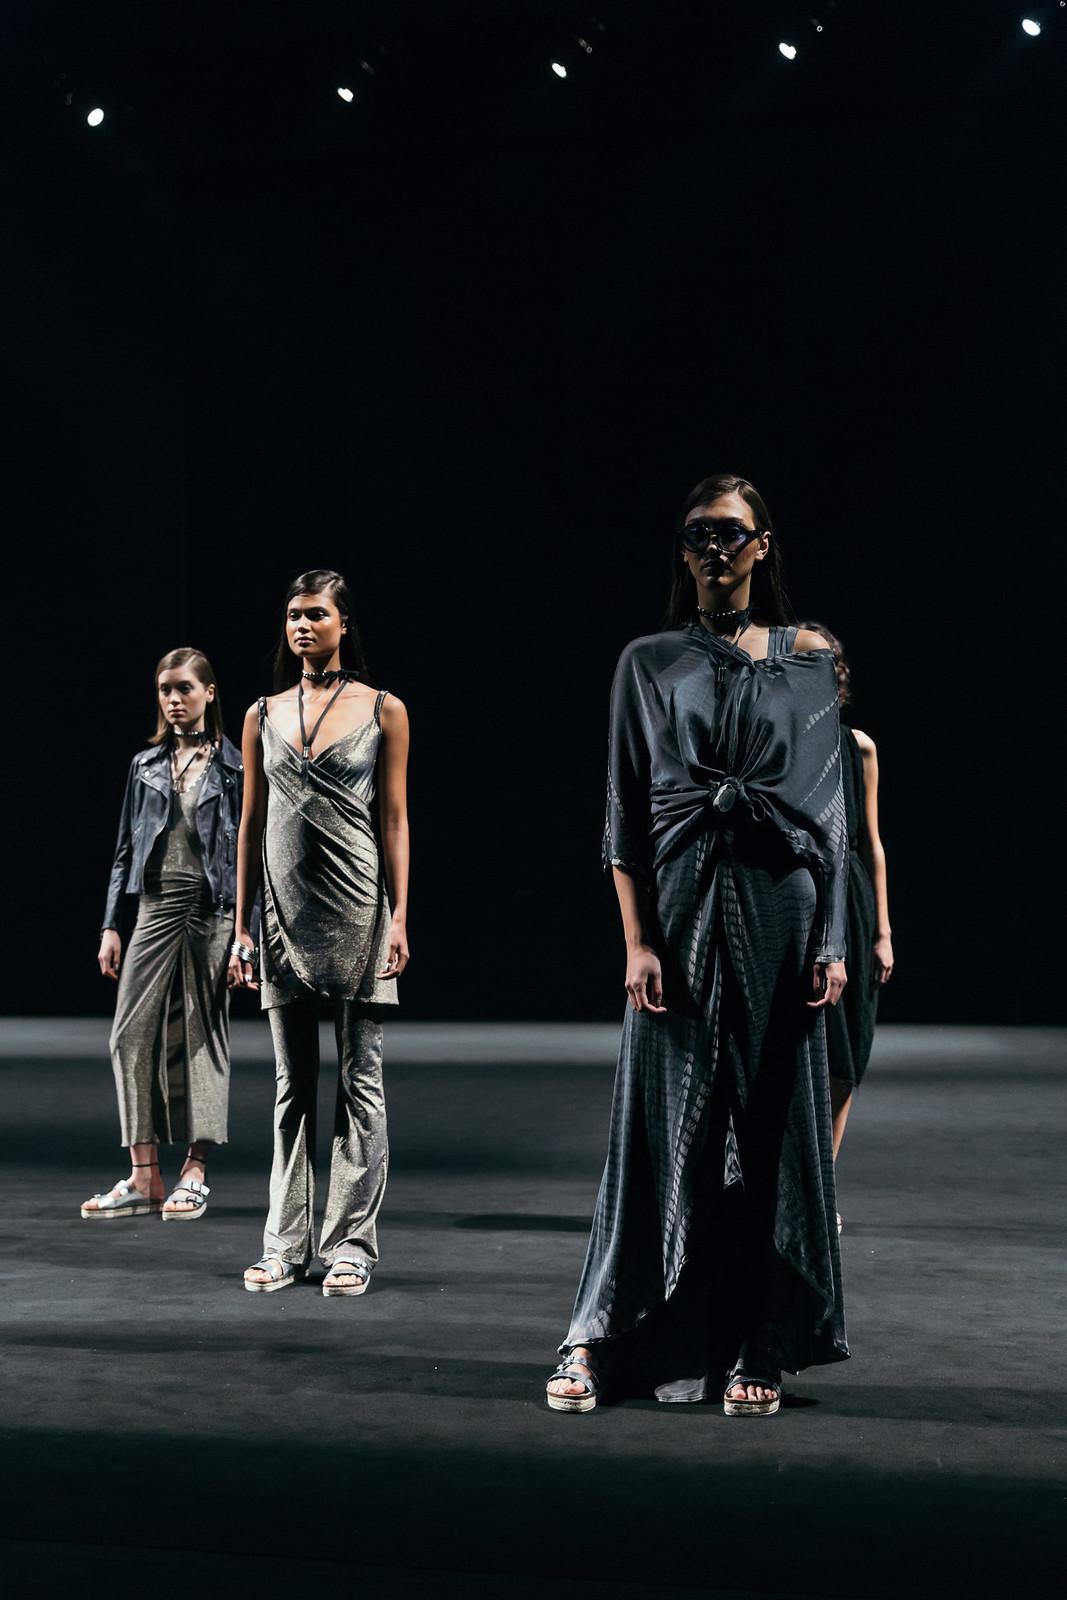 Jessie Chanes - Seams for a desire - 080 Bacelona Fashion #080bcnfasion -39